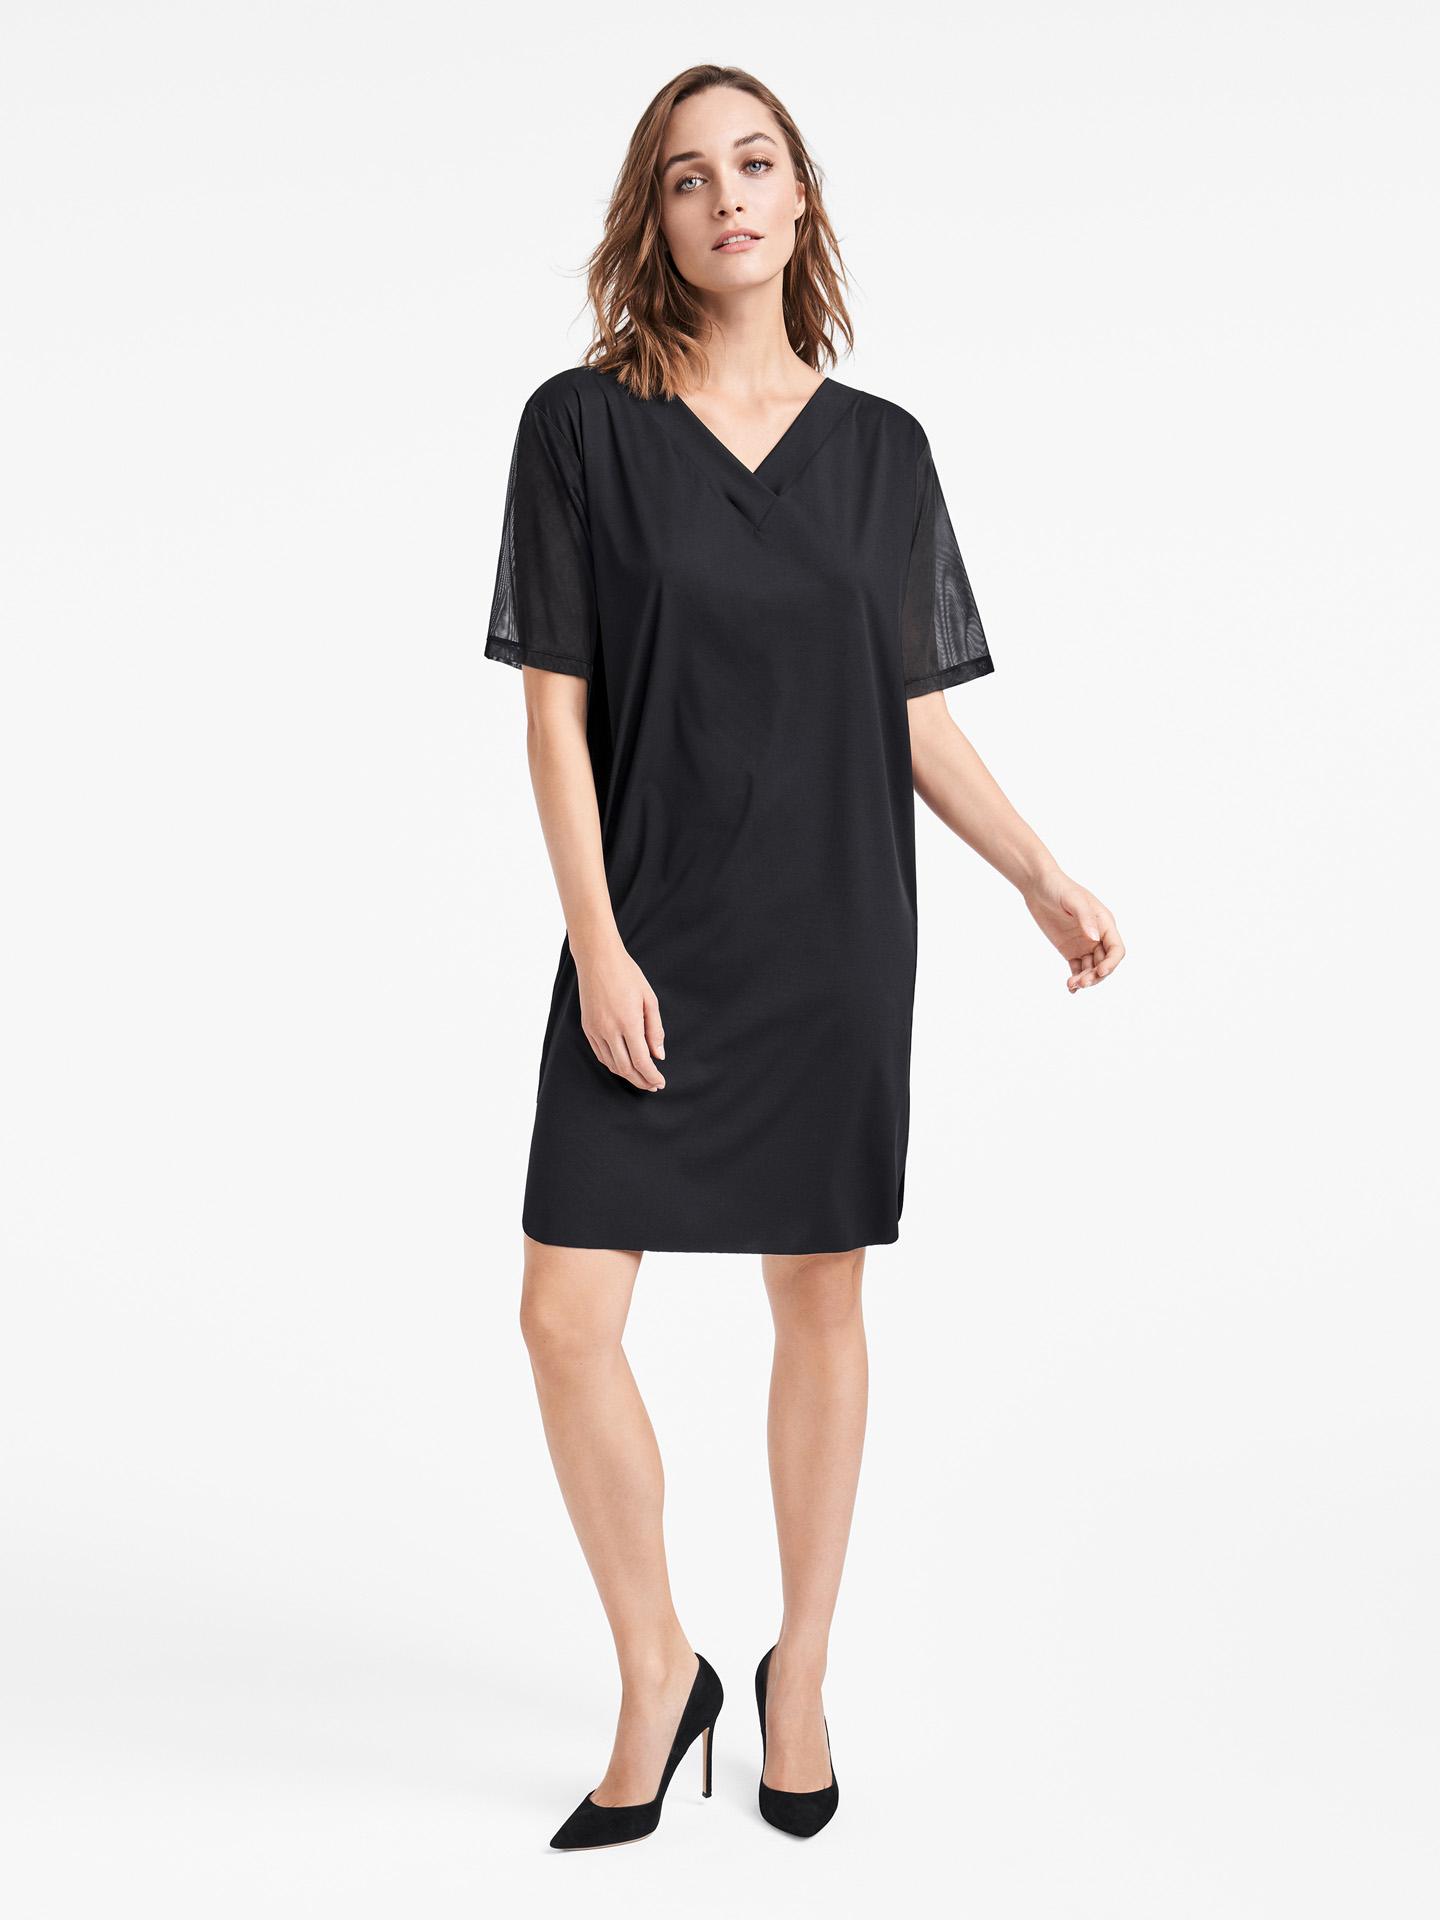 Wolford Apparel & Accessories > Clothing > Abbigliamento Donna Jellyfish Dress